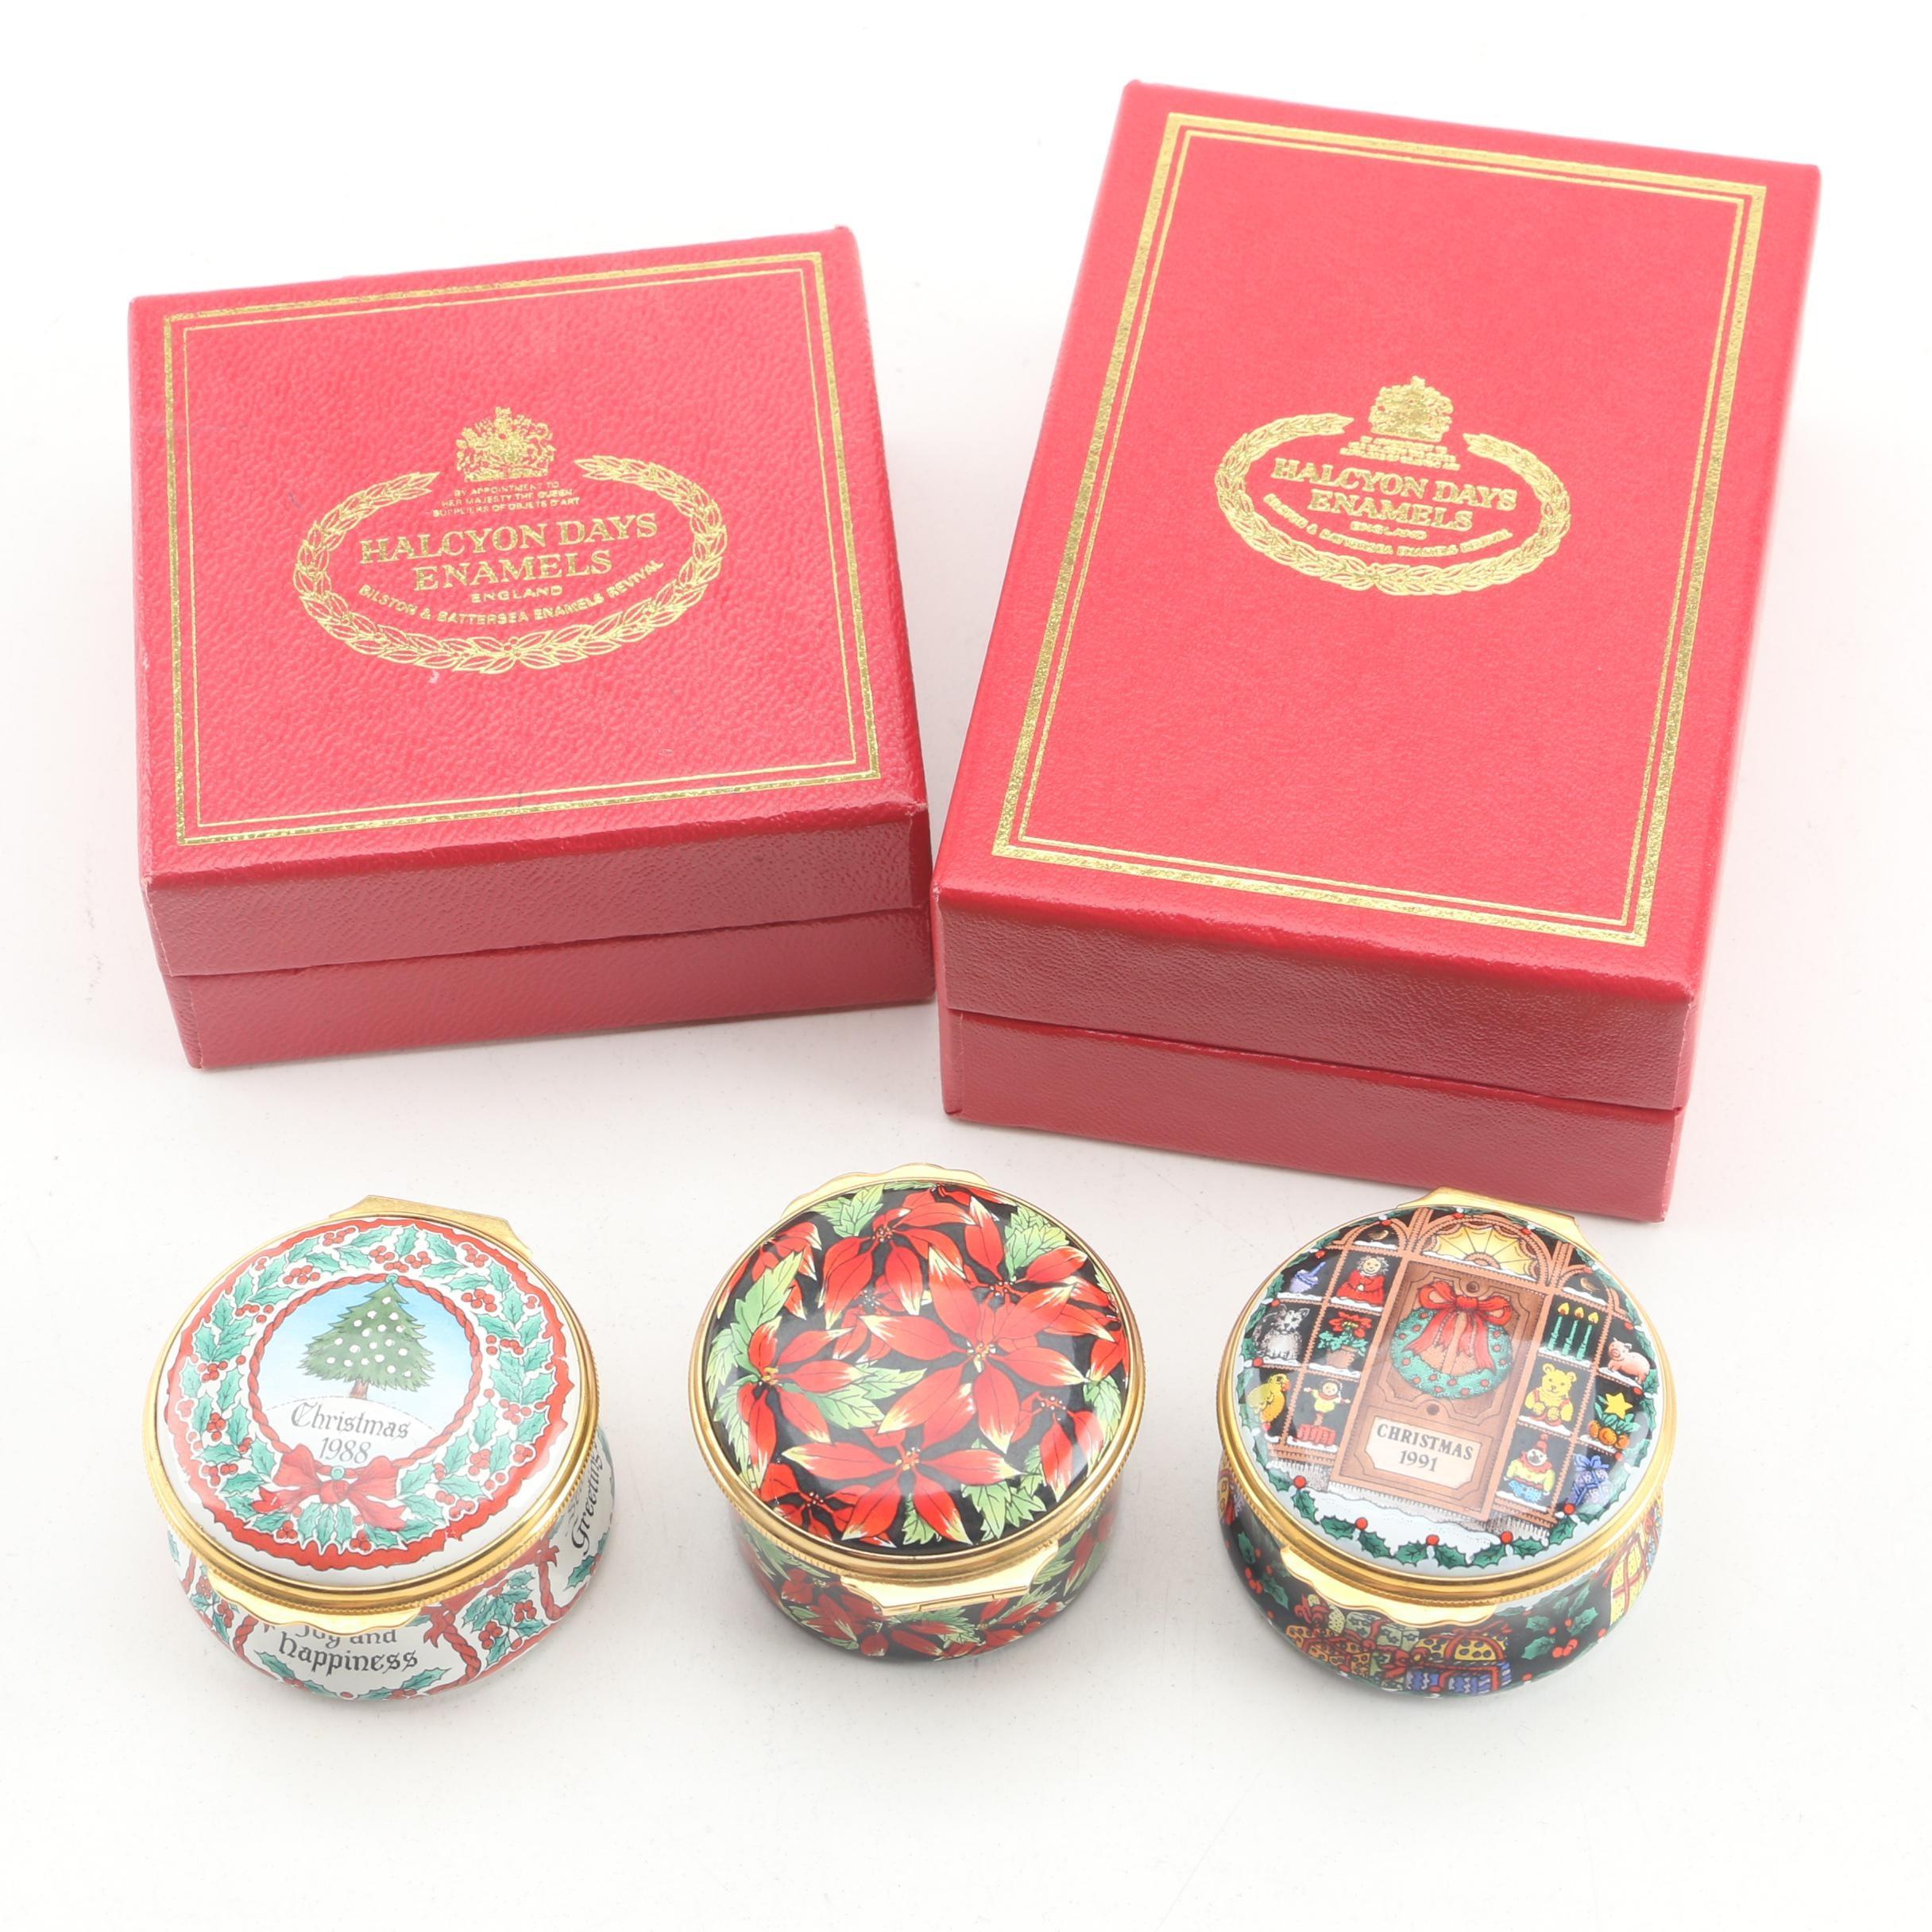 Halcyon Days Enamels Annual Christmas Enameled Trinket Boxes, Circa 1988-1991